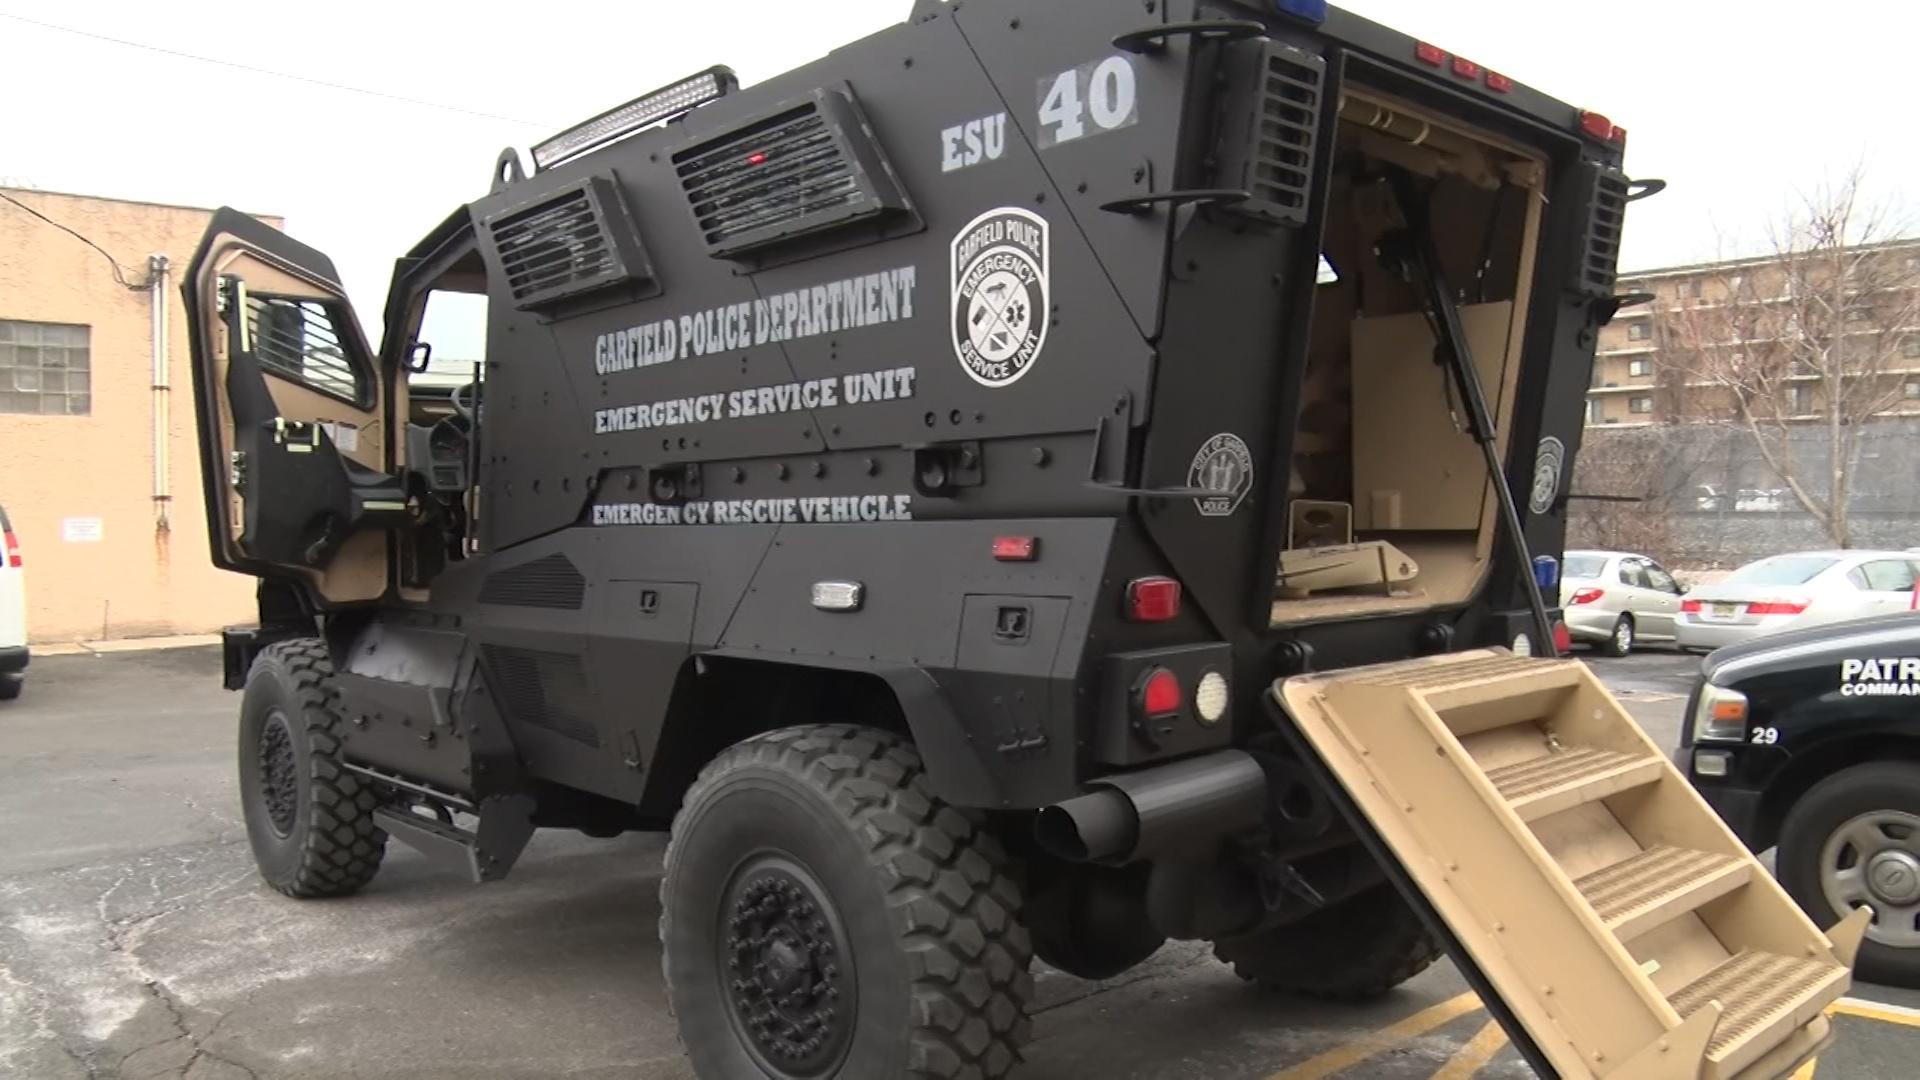 How Nj Police Are Using Surplus Military Equipment Video Nj Spotlight News